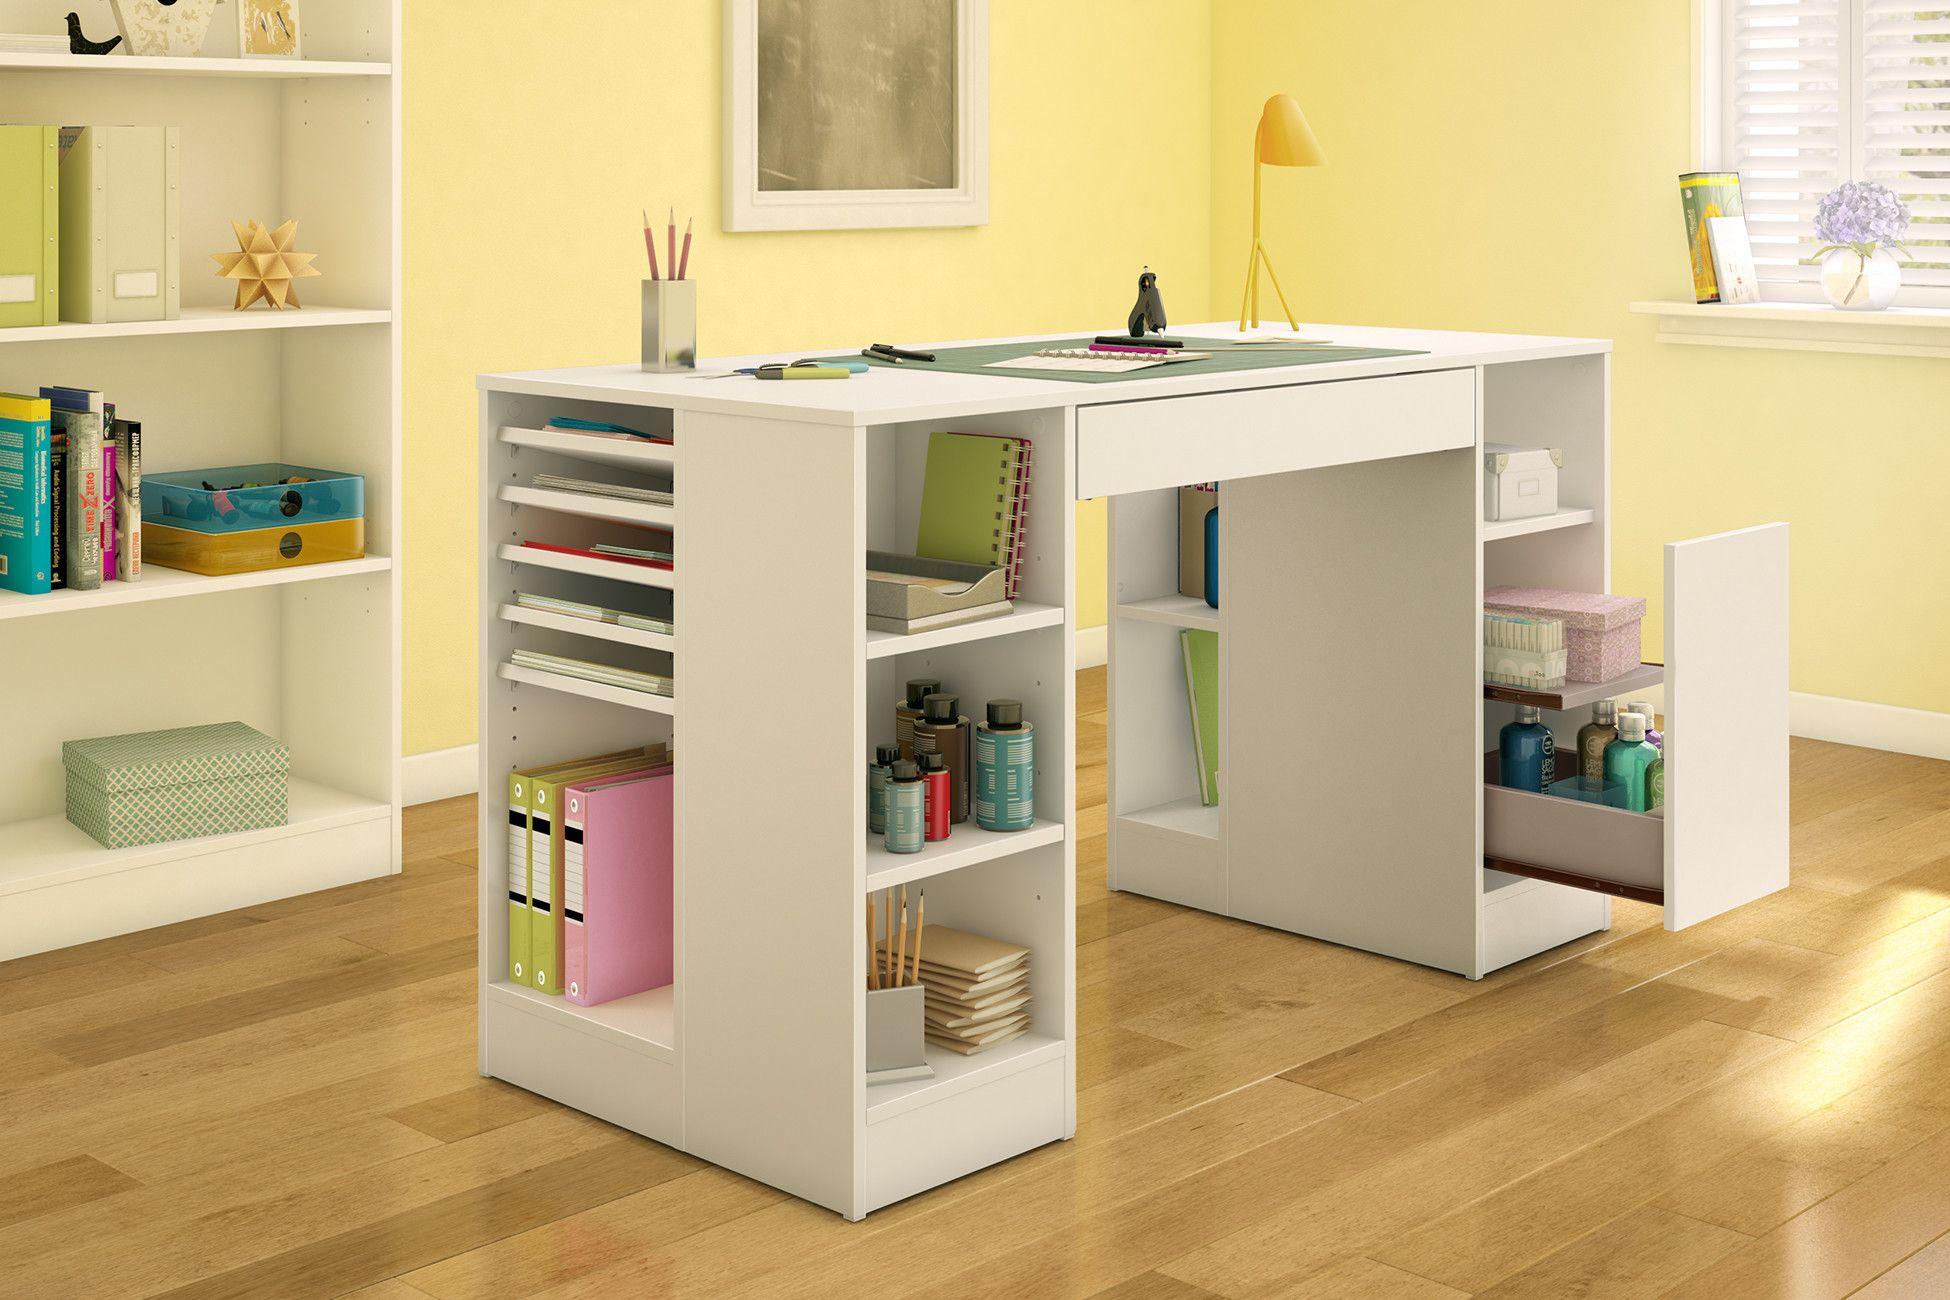 Crea 53 5 X 23 6 Craft Table Craft Table Diy Craft Table Craft Room Storage